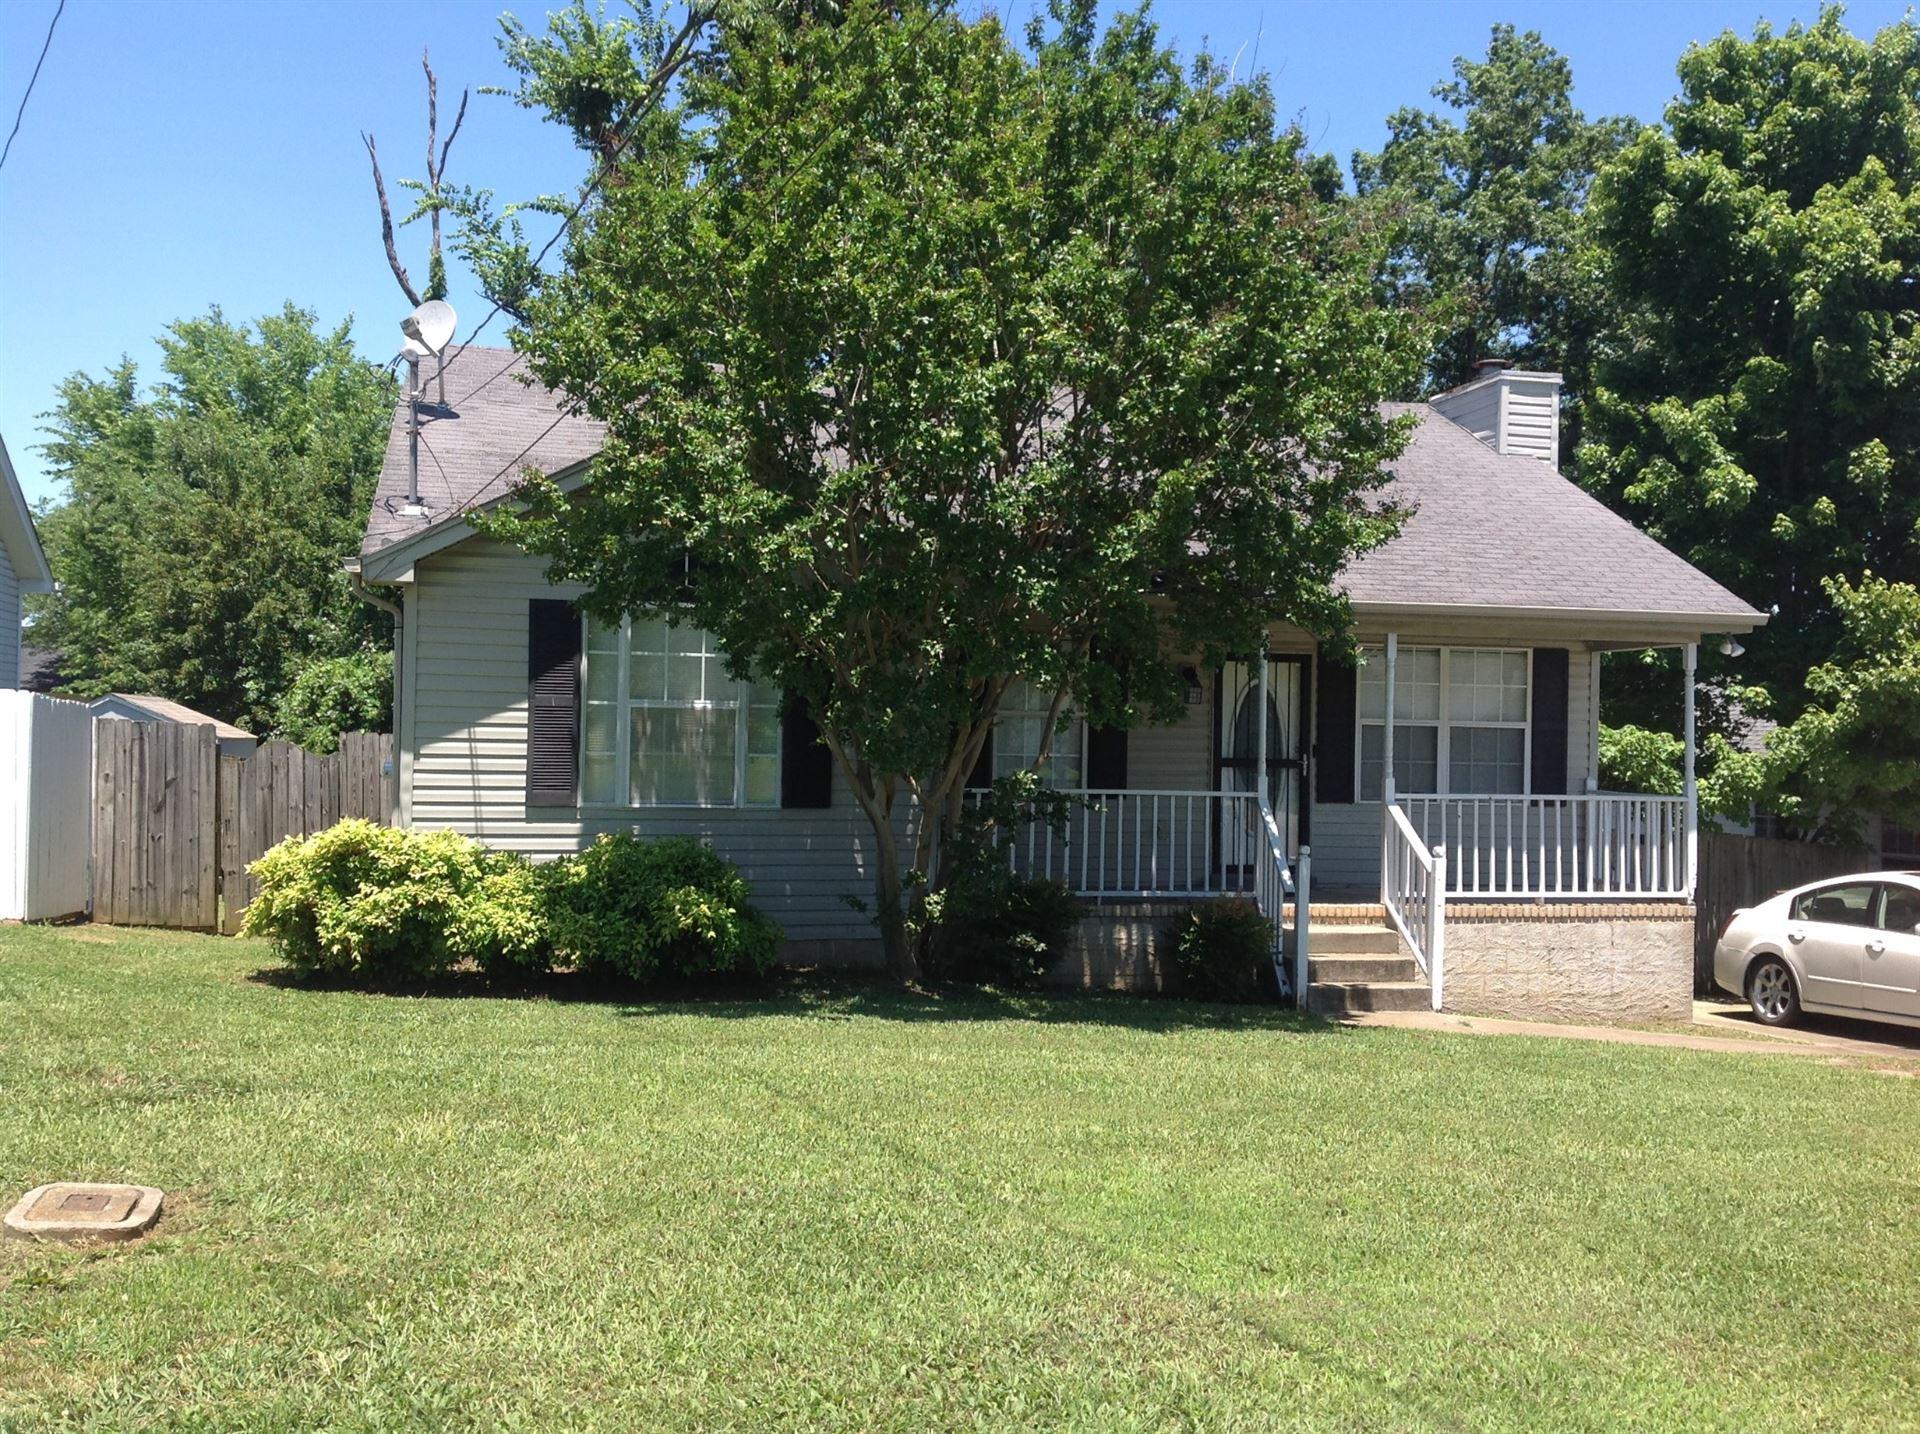 Photo of 304 Cedar Park Cir, LaVergne, TN 37086 (MLS # 2263305)